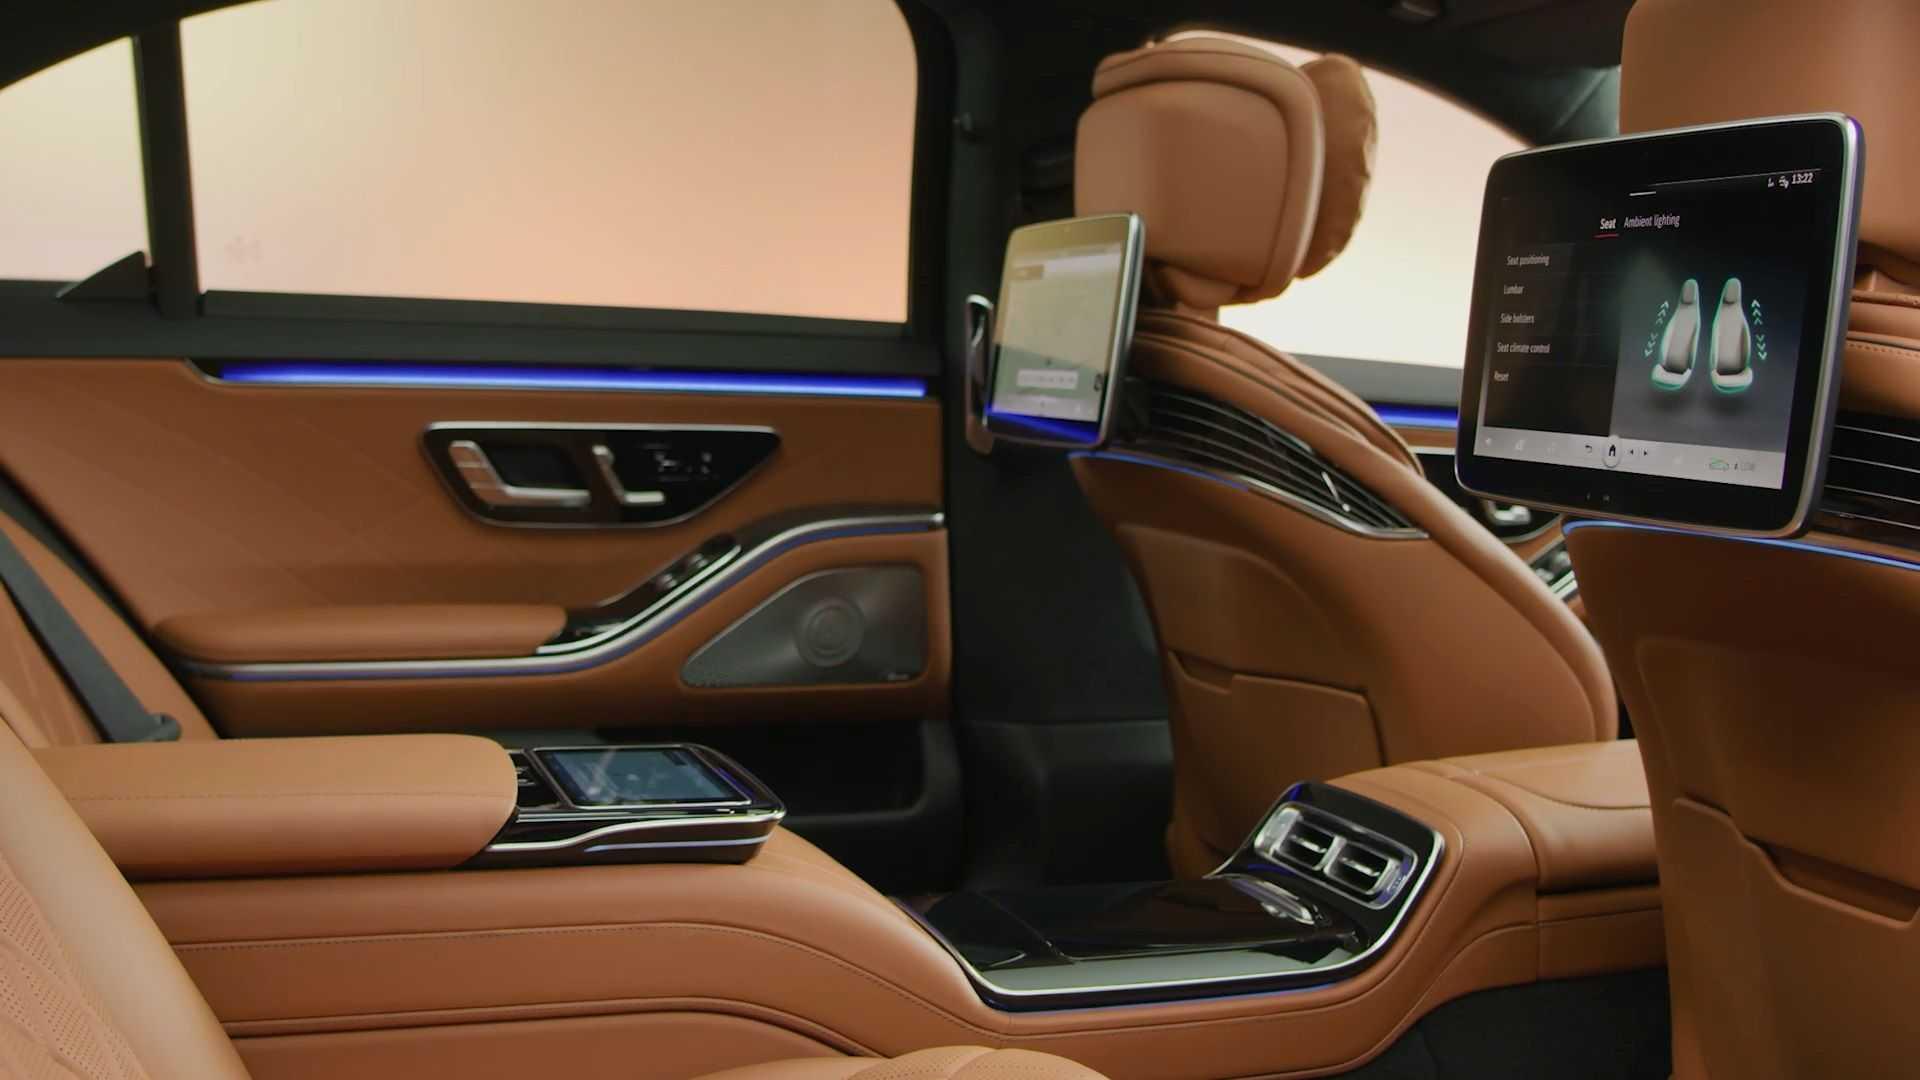 2021-mercedes-s-class-interior (2)